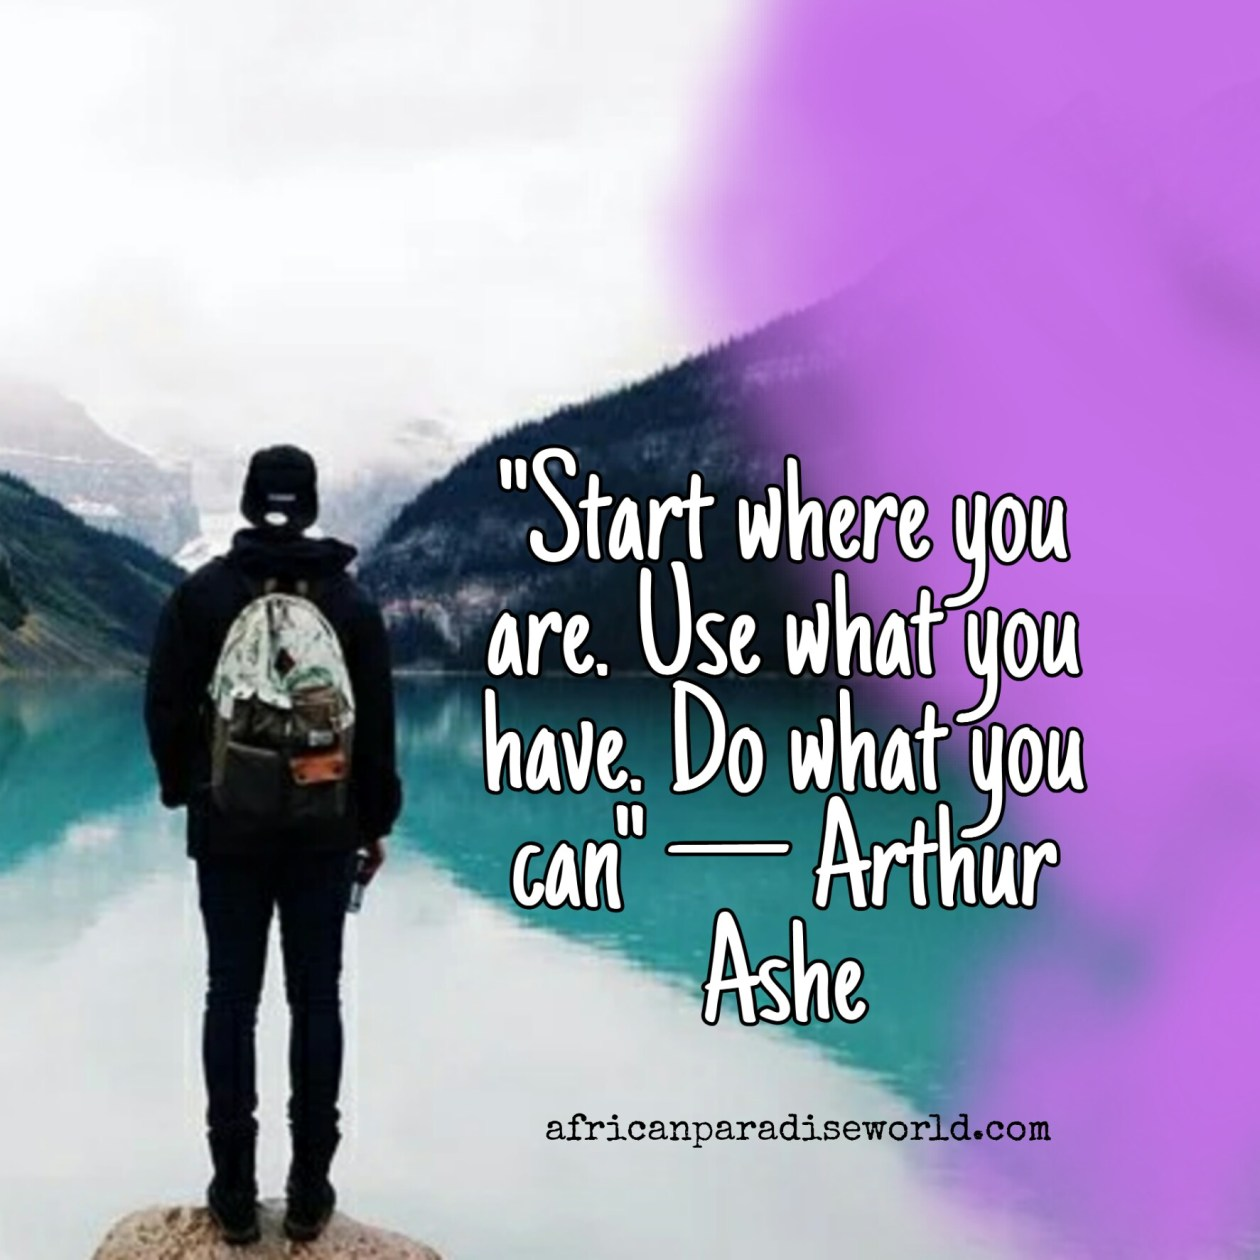 Success inspirational quotes —Arthur Ashe